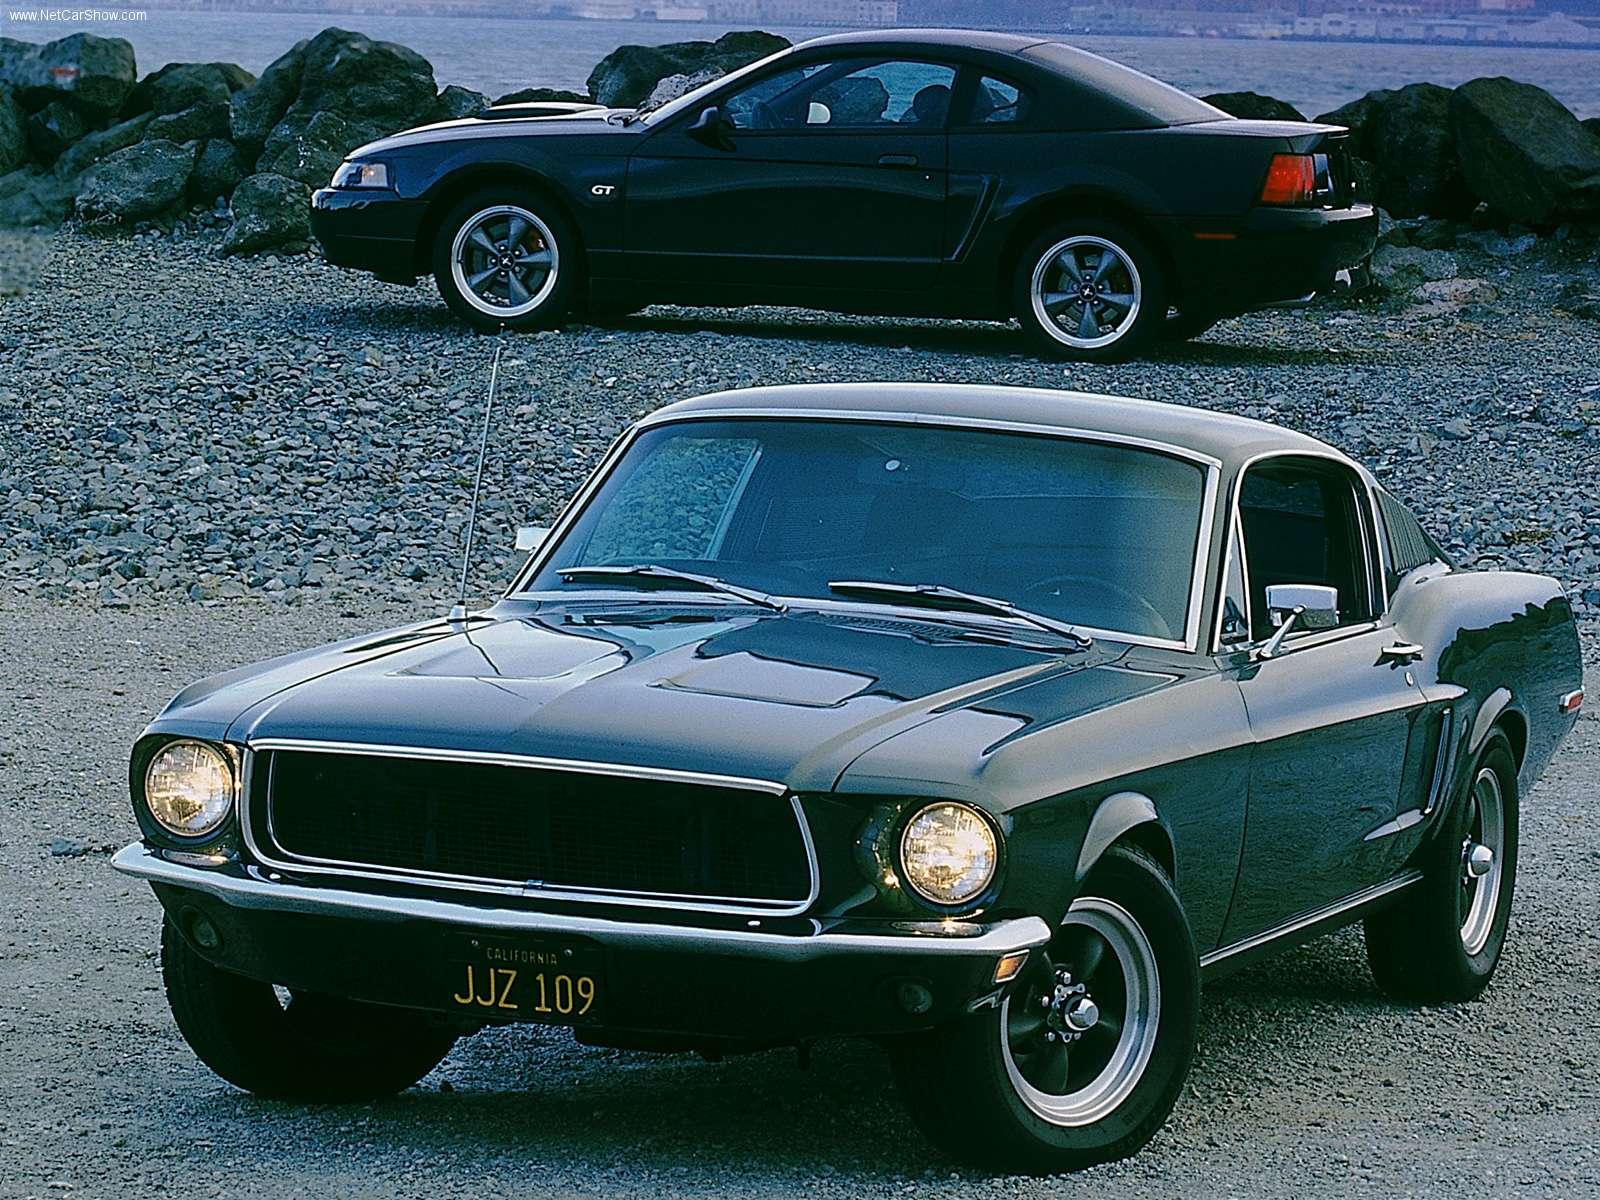 ford mustang bullitt fastback 1968 wallpaper 1600x1200 221983 wallpaperup. Black Bedroom Furniture Sets. Home Design Ideas